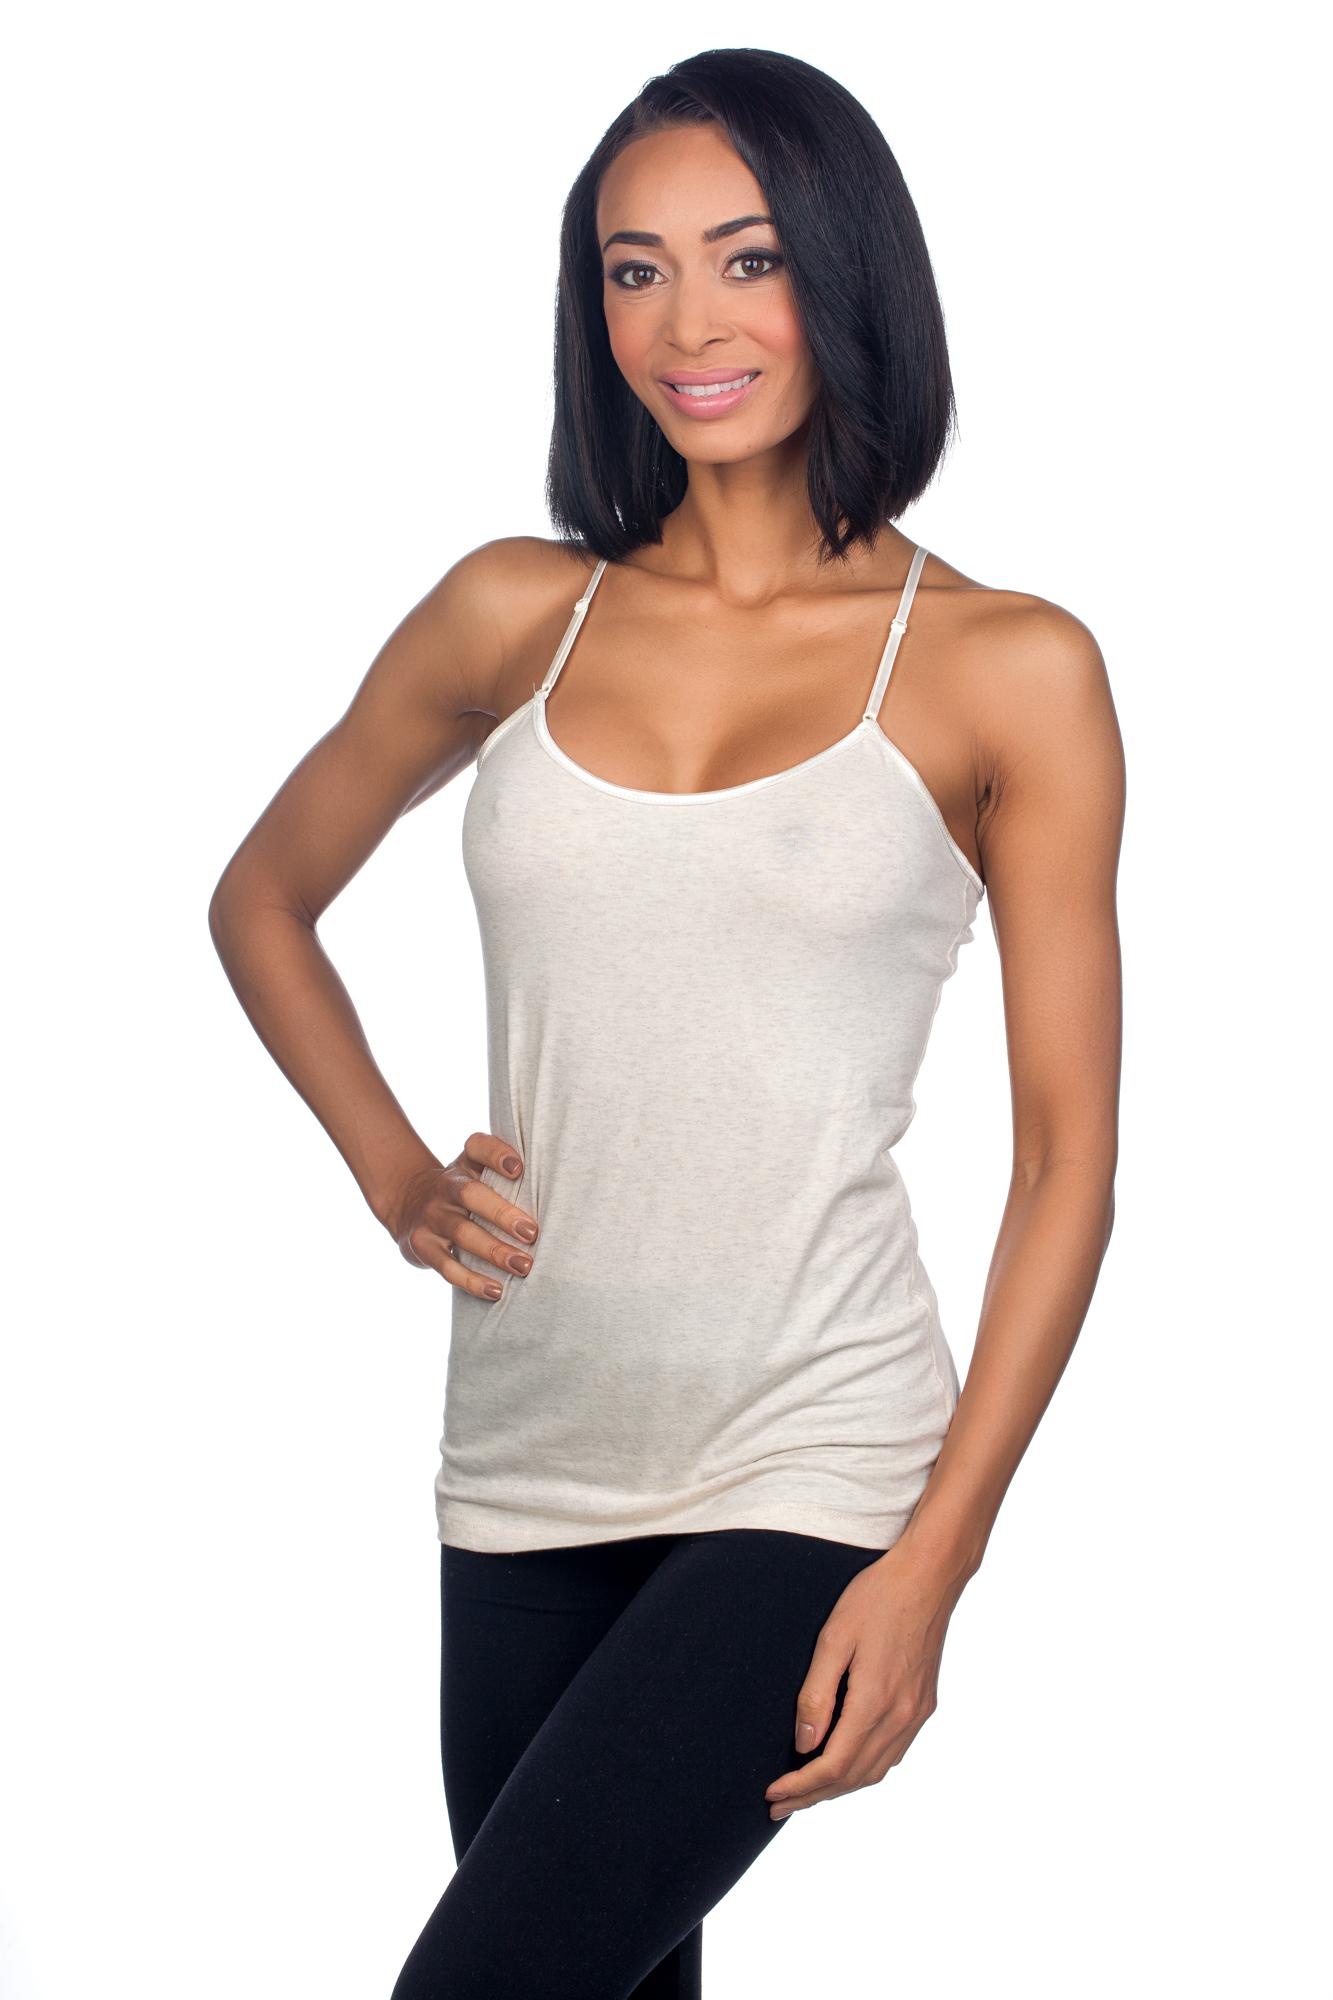 tresics femme basic no shelf bra camisole cc1610 ebay. Black Bedroom Furniture Sets. Home Design Ideas